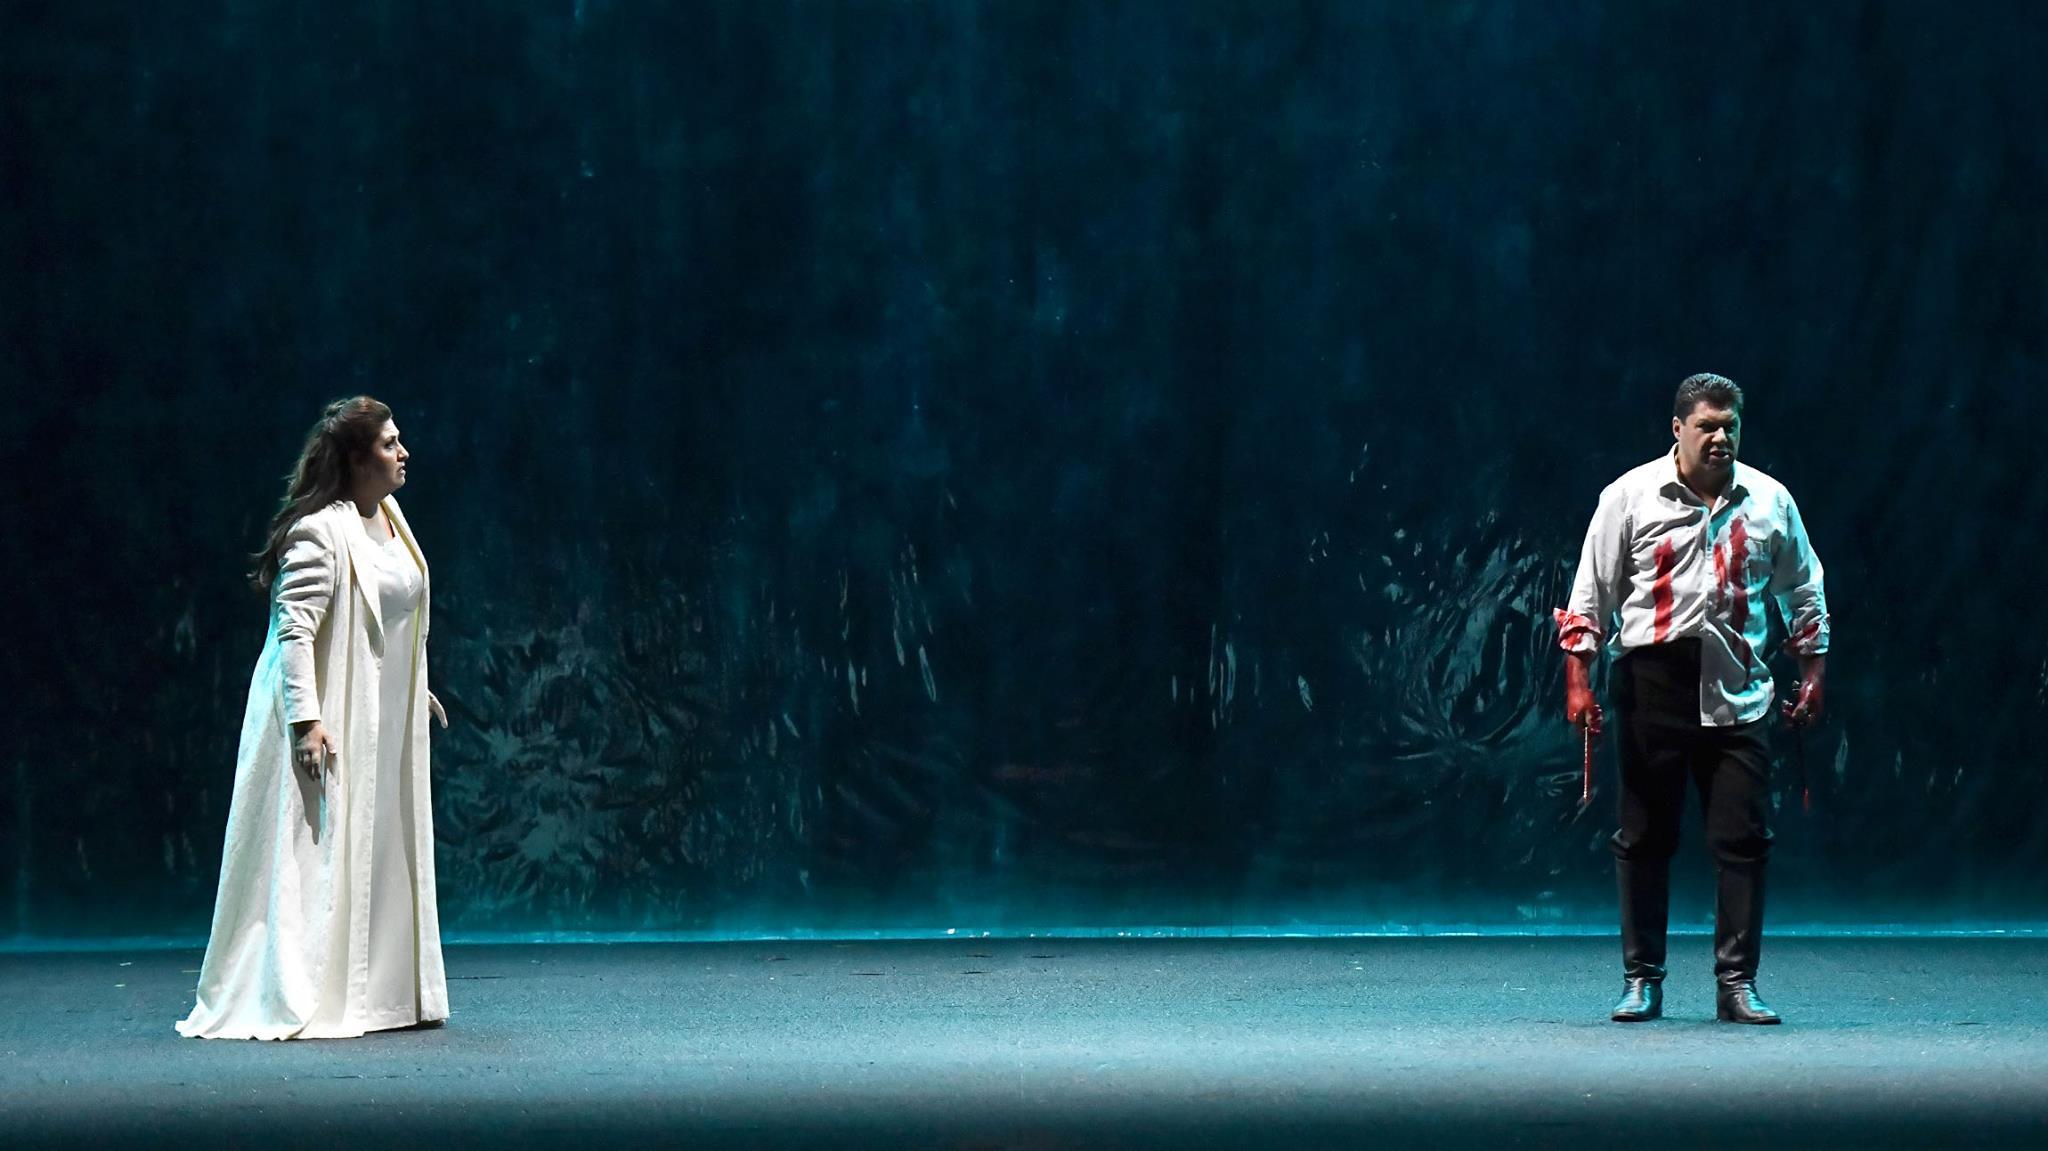 Macbeth, Teatro Regio, Parma, Festival Verdi, Giuseppe Verdi, Daniele Abbado, Luca Salsi, Anna Pirozzi, Opera